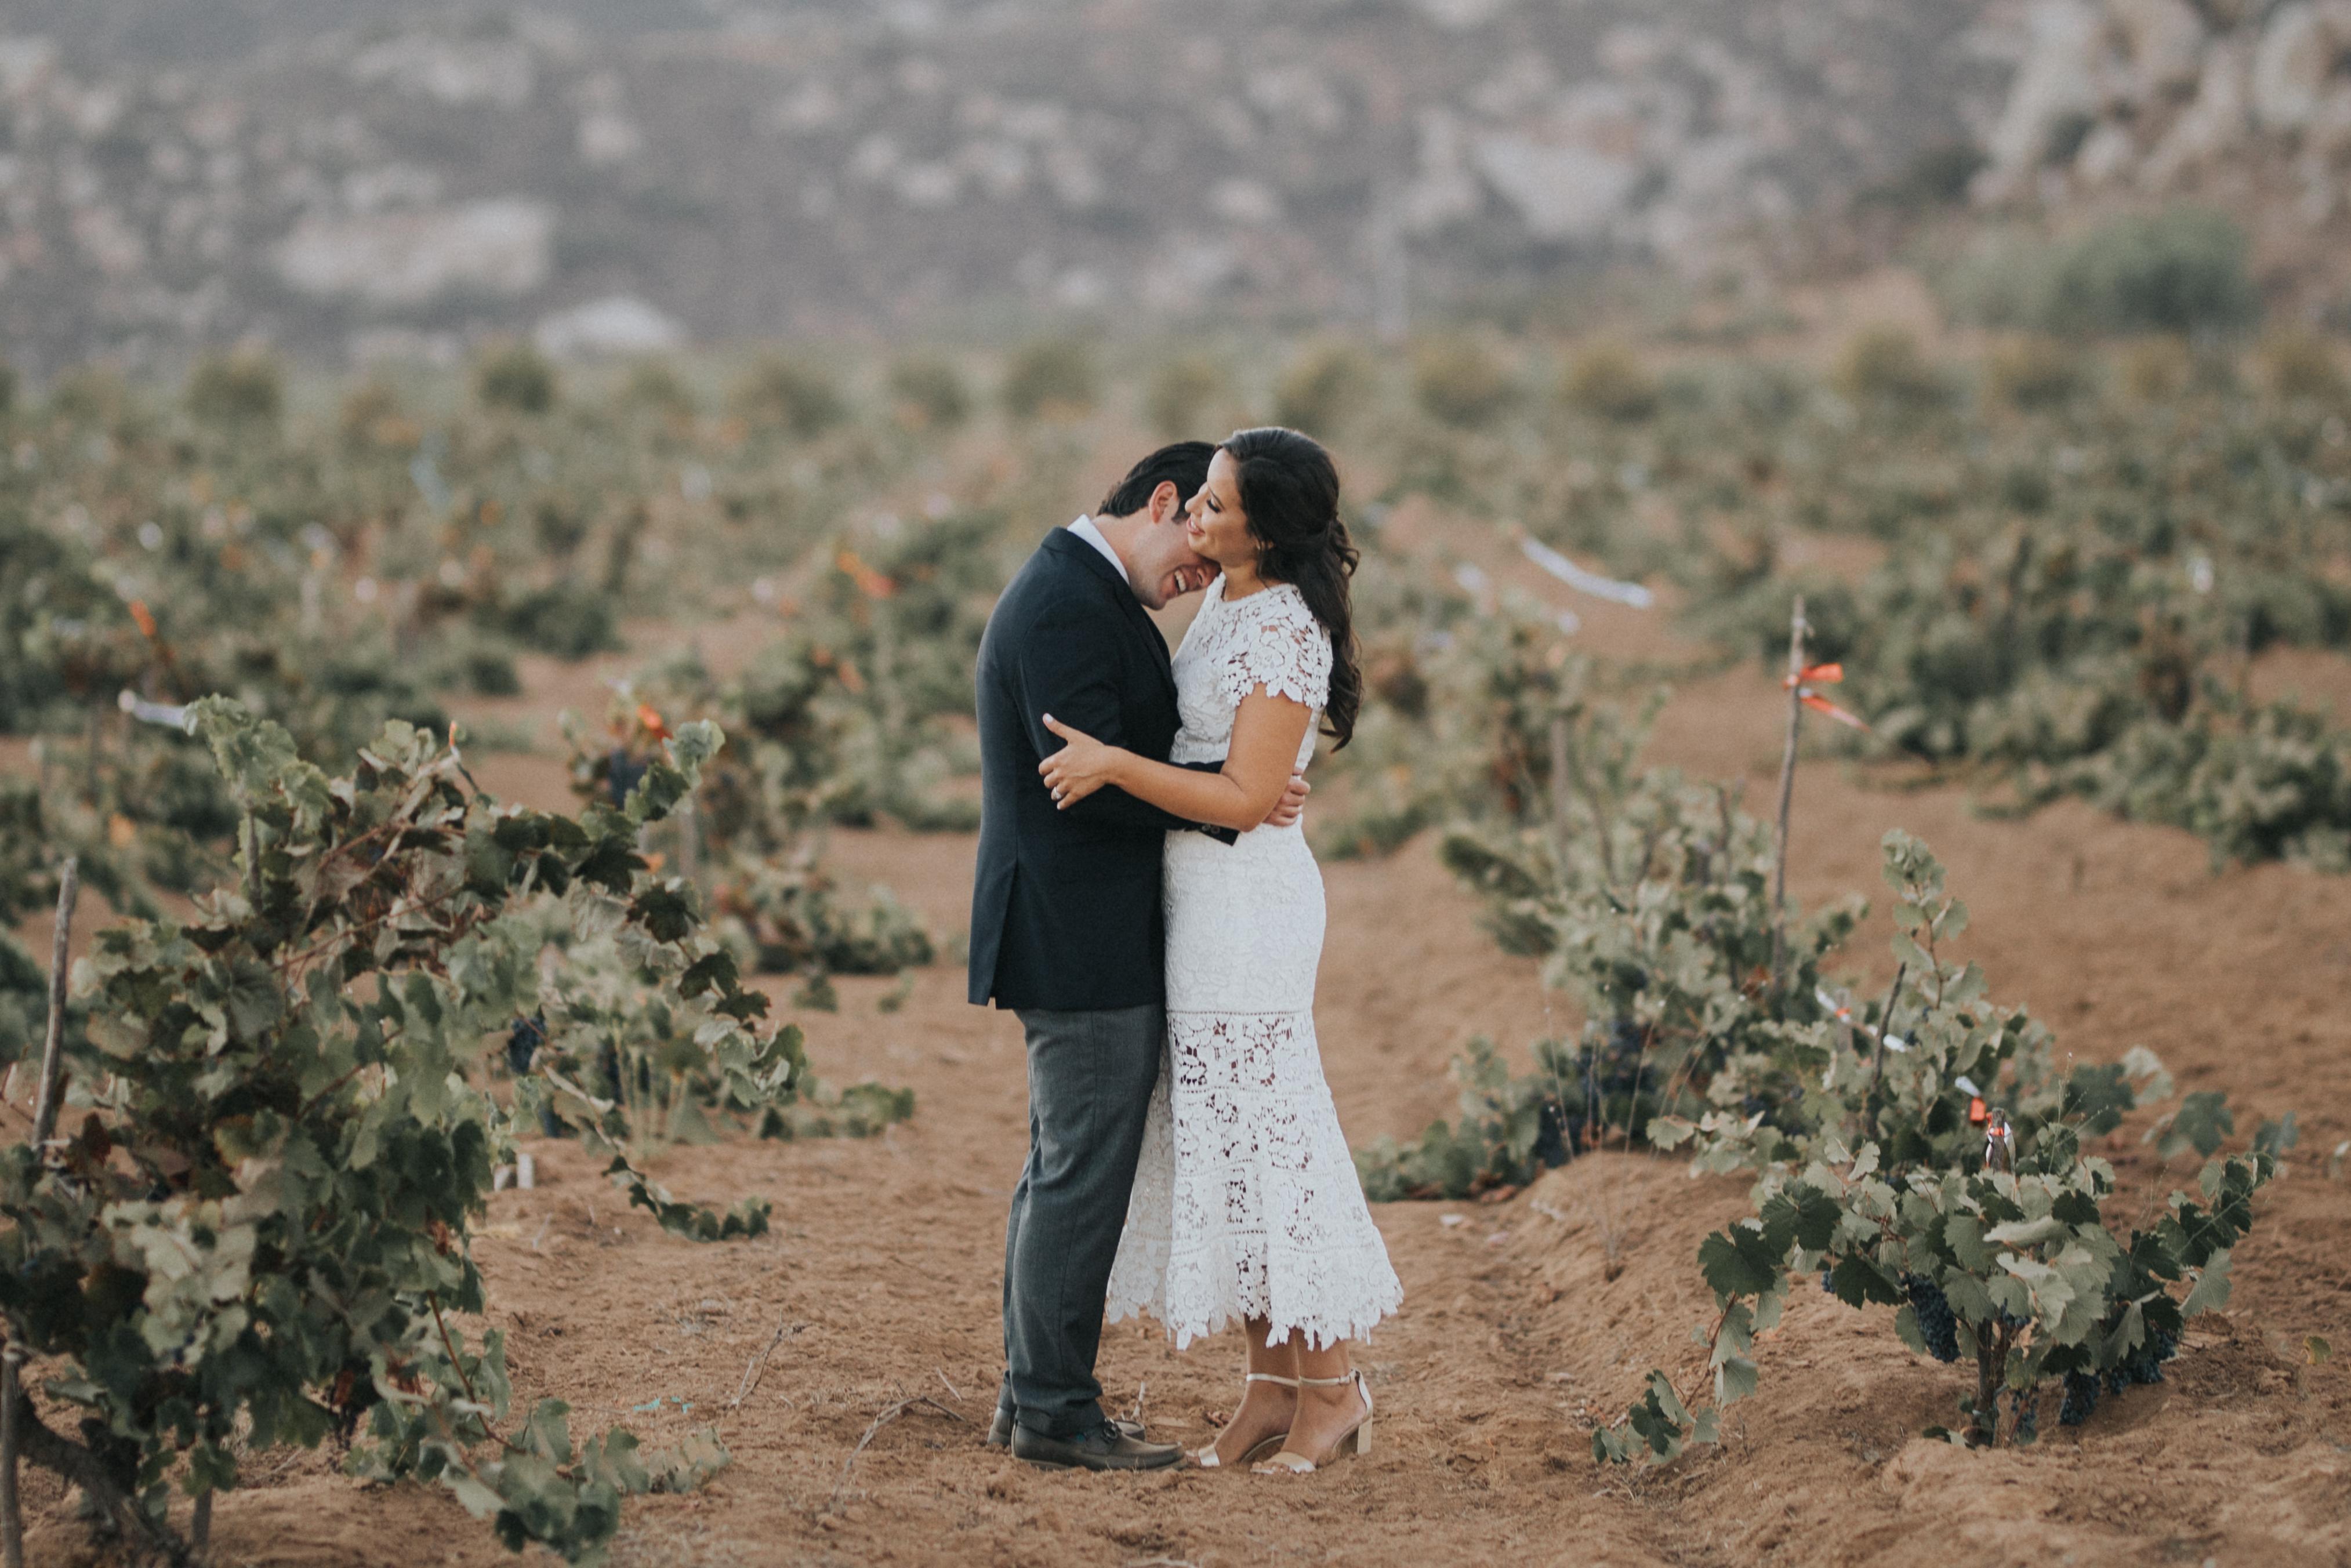 Erika + Raúl | Guadalupe, Mexico | Decantos Vineyard